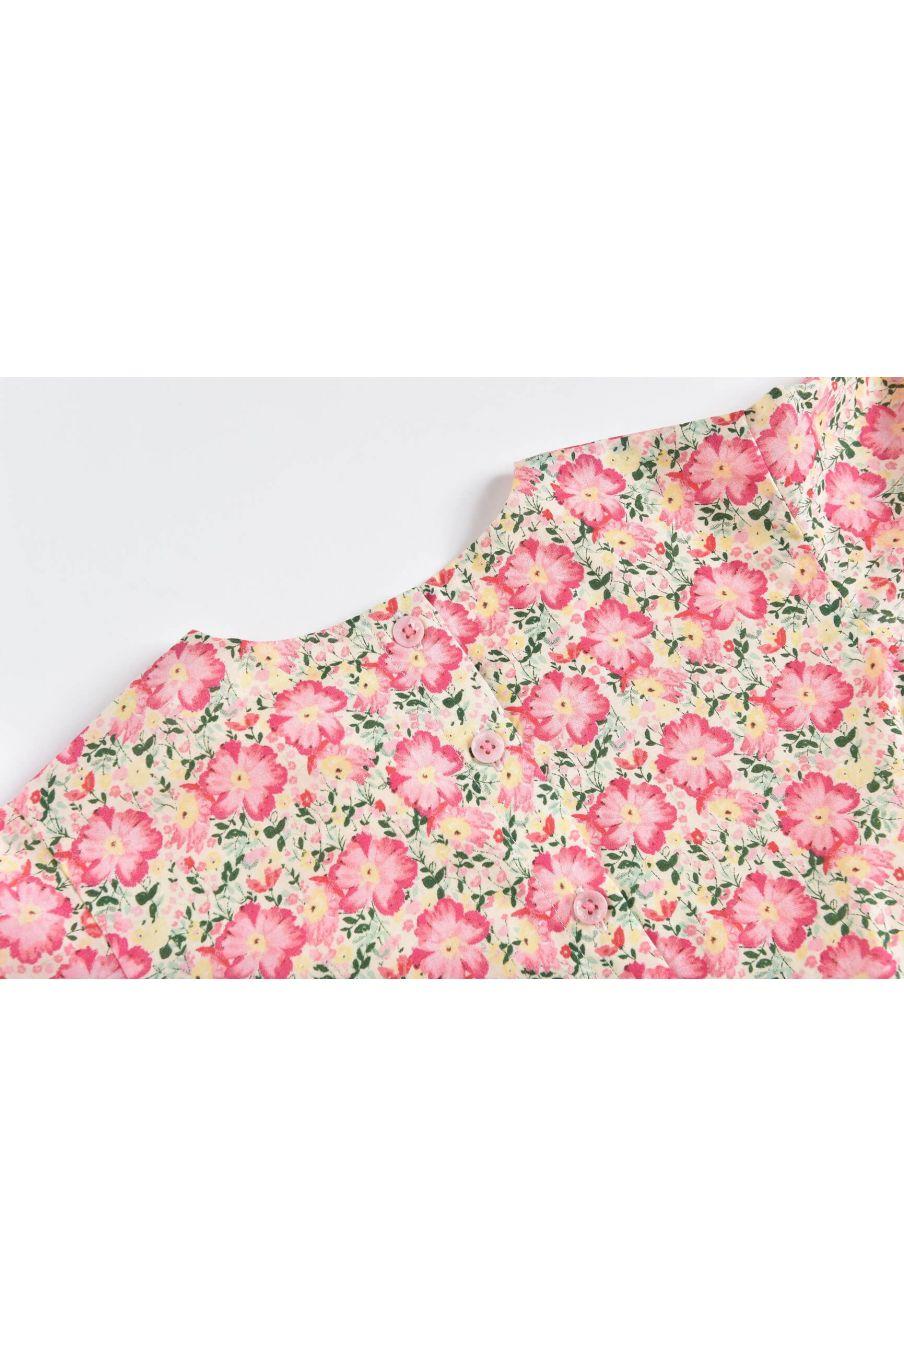 boheme chic vintage combinaison fille mayalia pink meadow